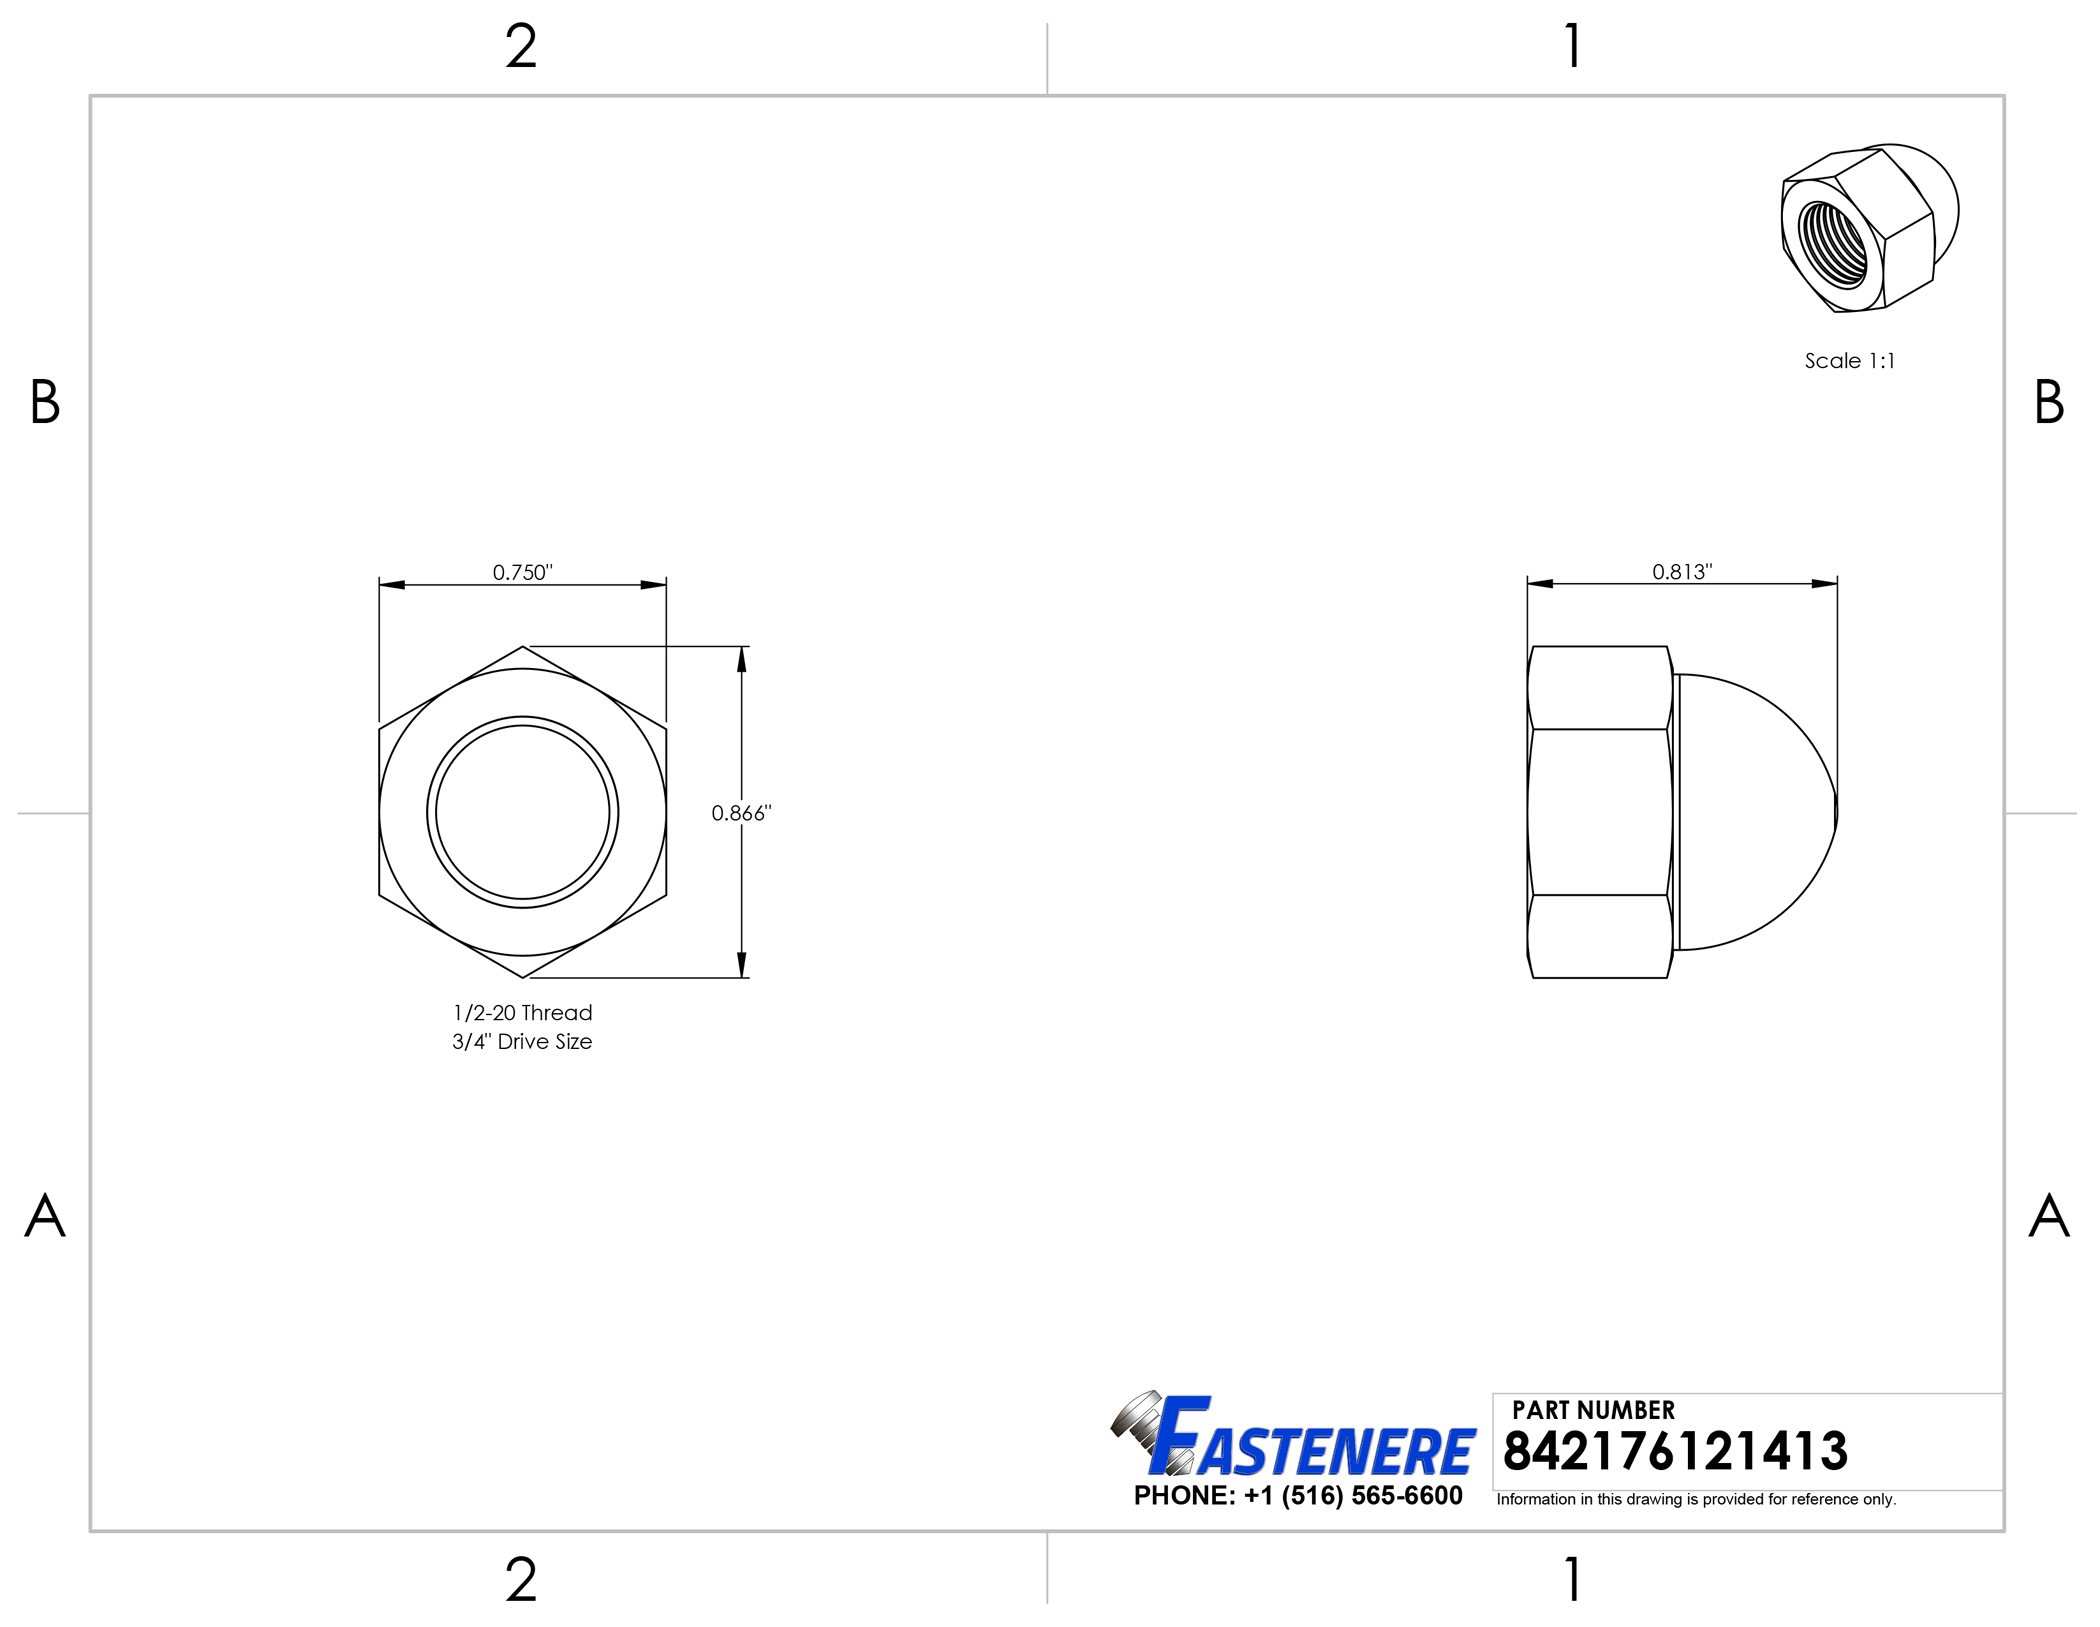 1/2-20 Acorn Cap Nuts Stainless Steel 18-8 Standard Height Quantity 10 Nakrętki kołpakowe